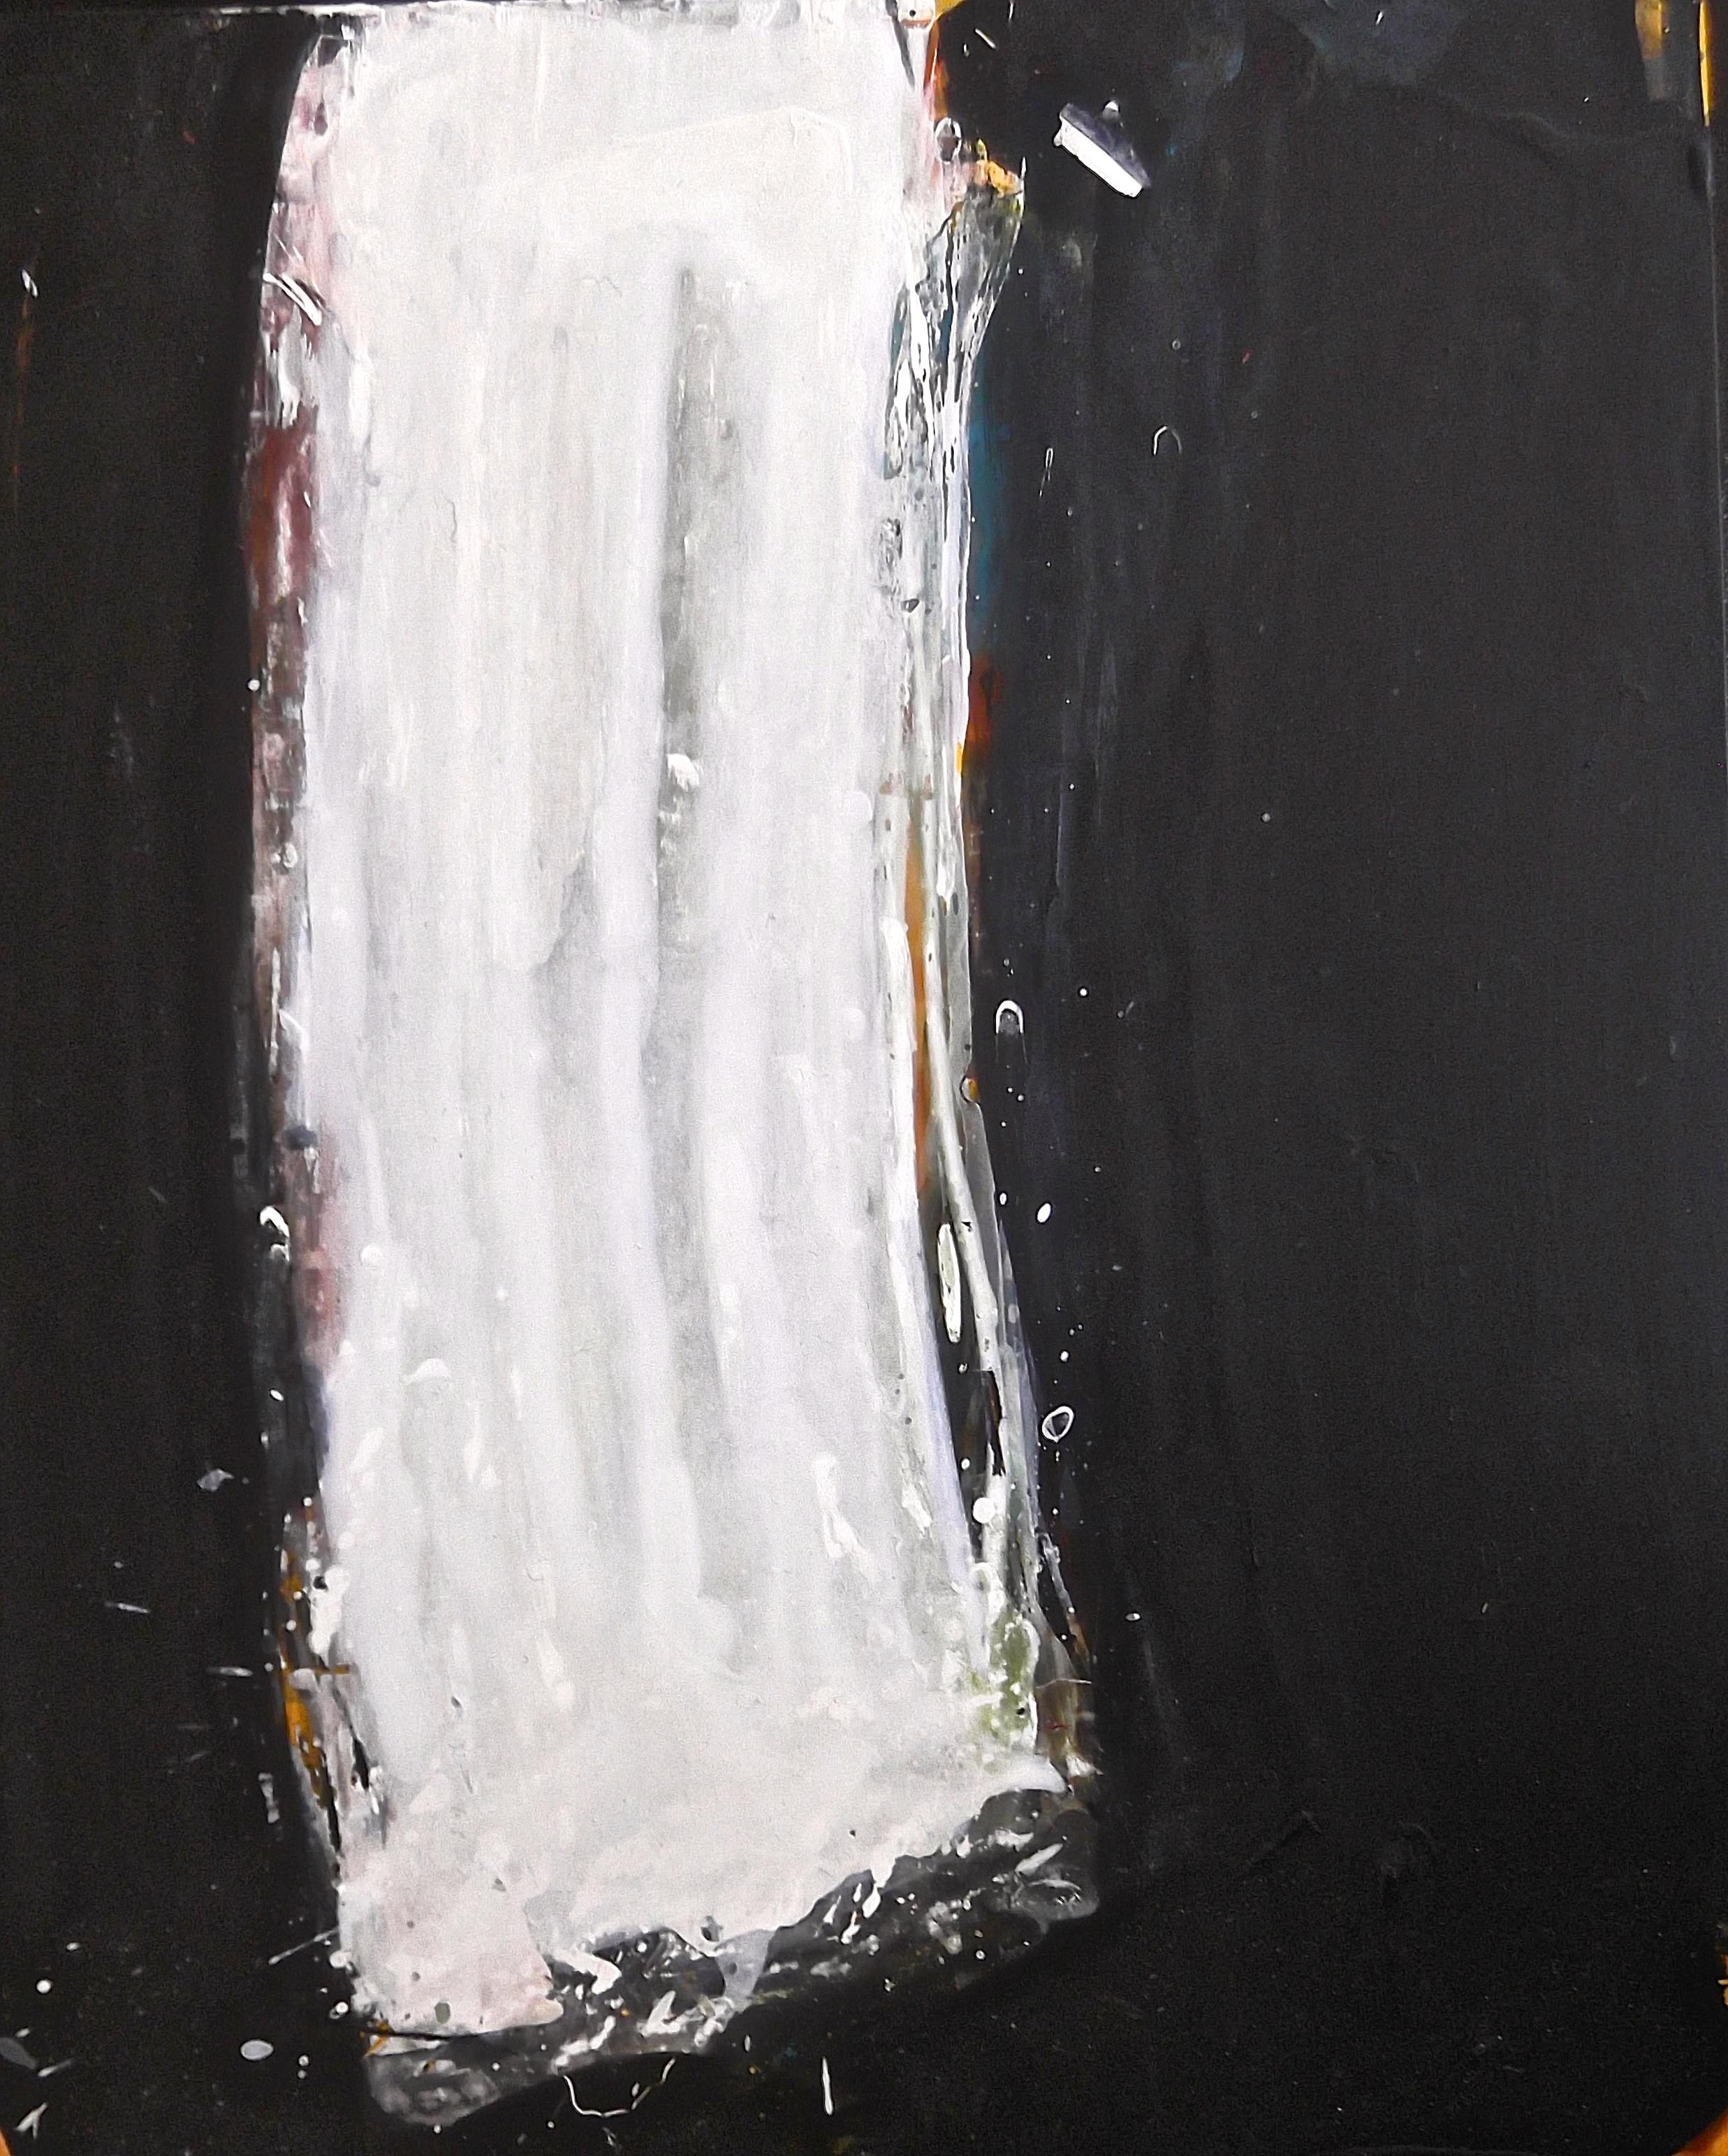 44 waterfall